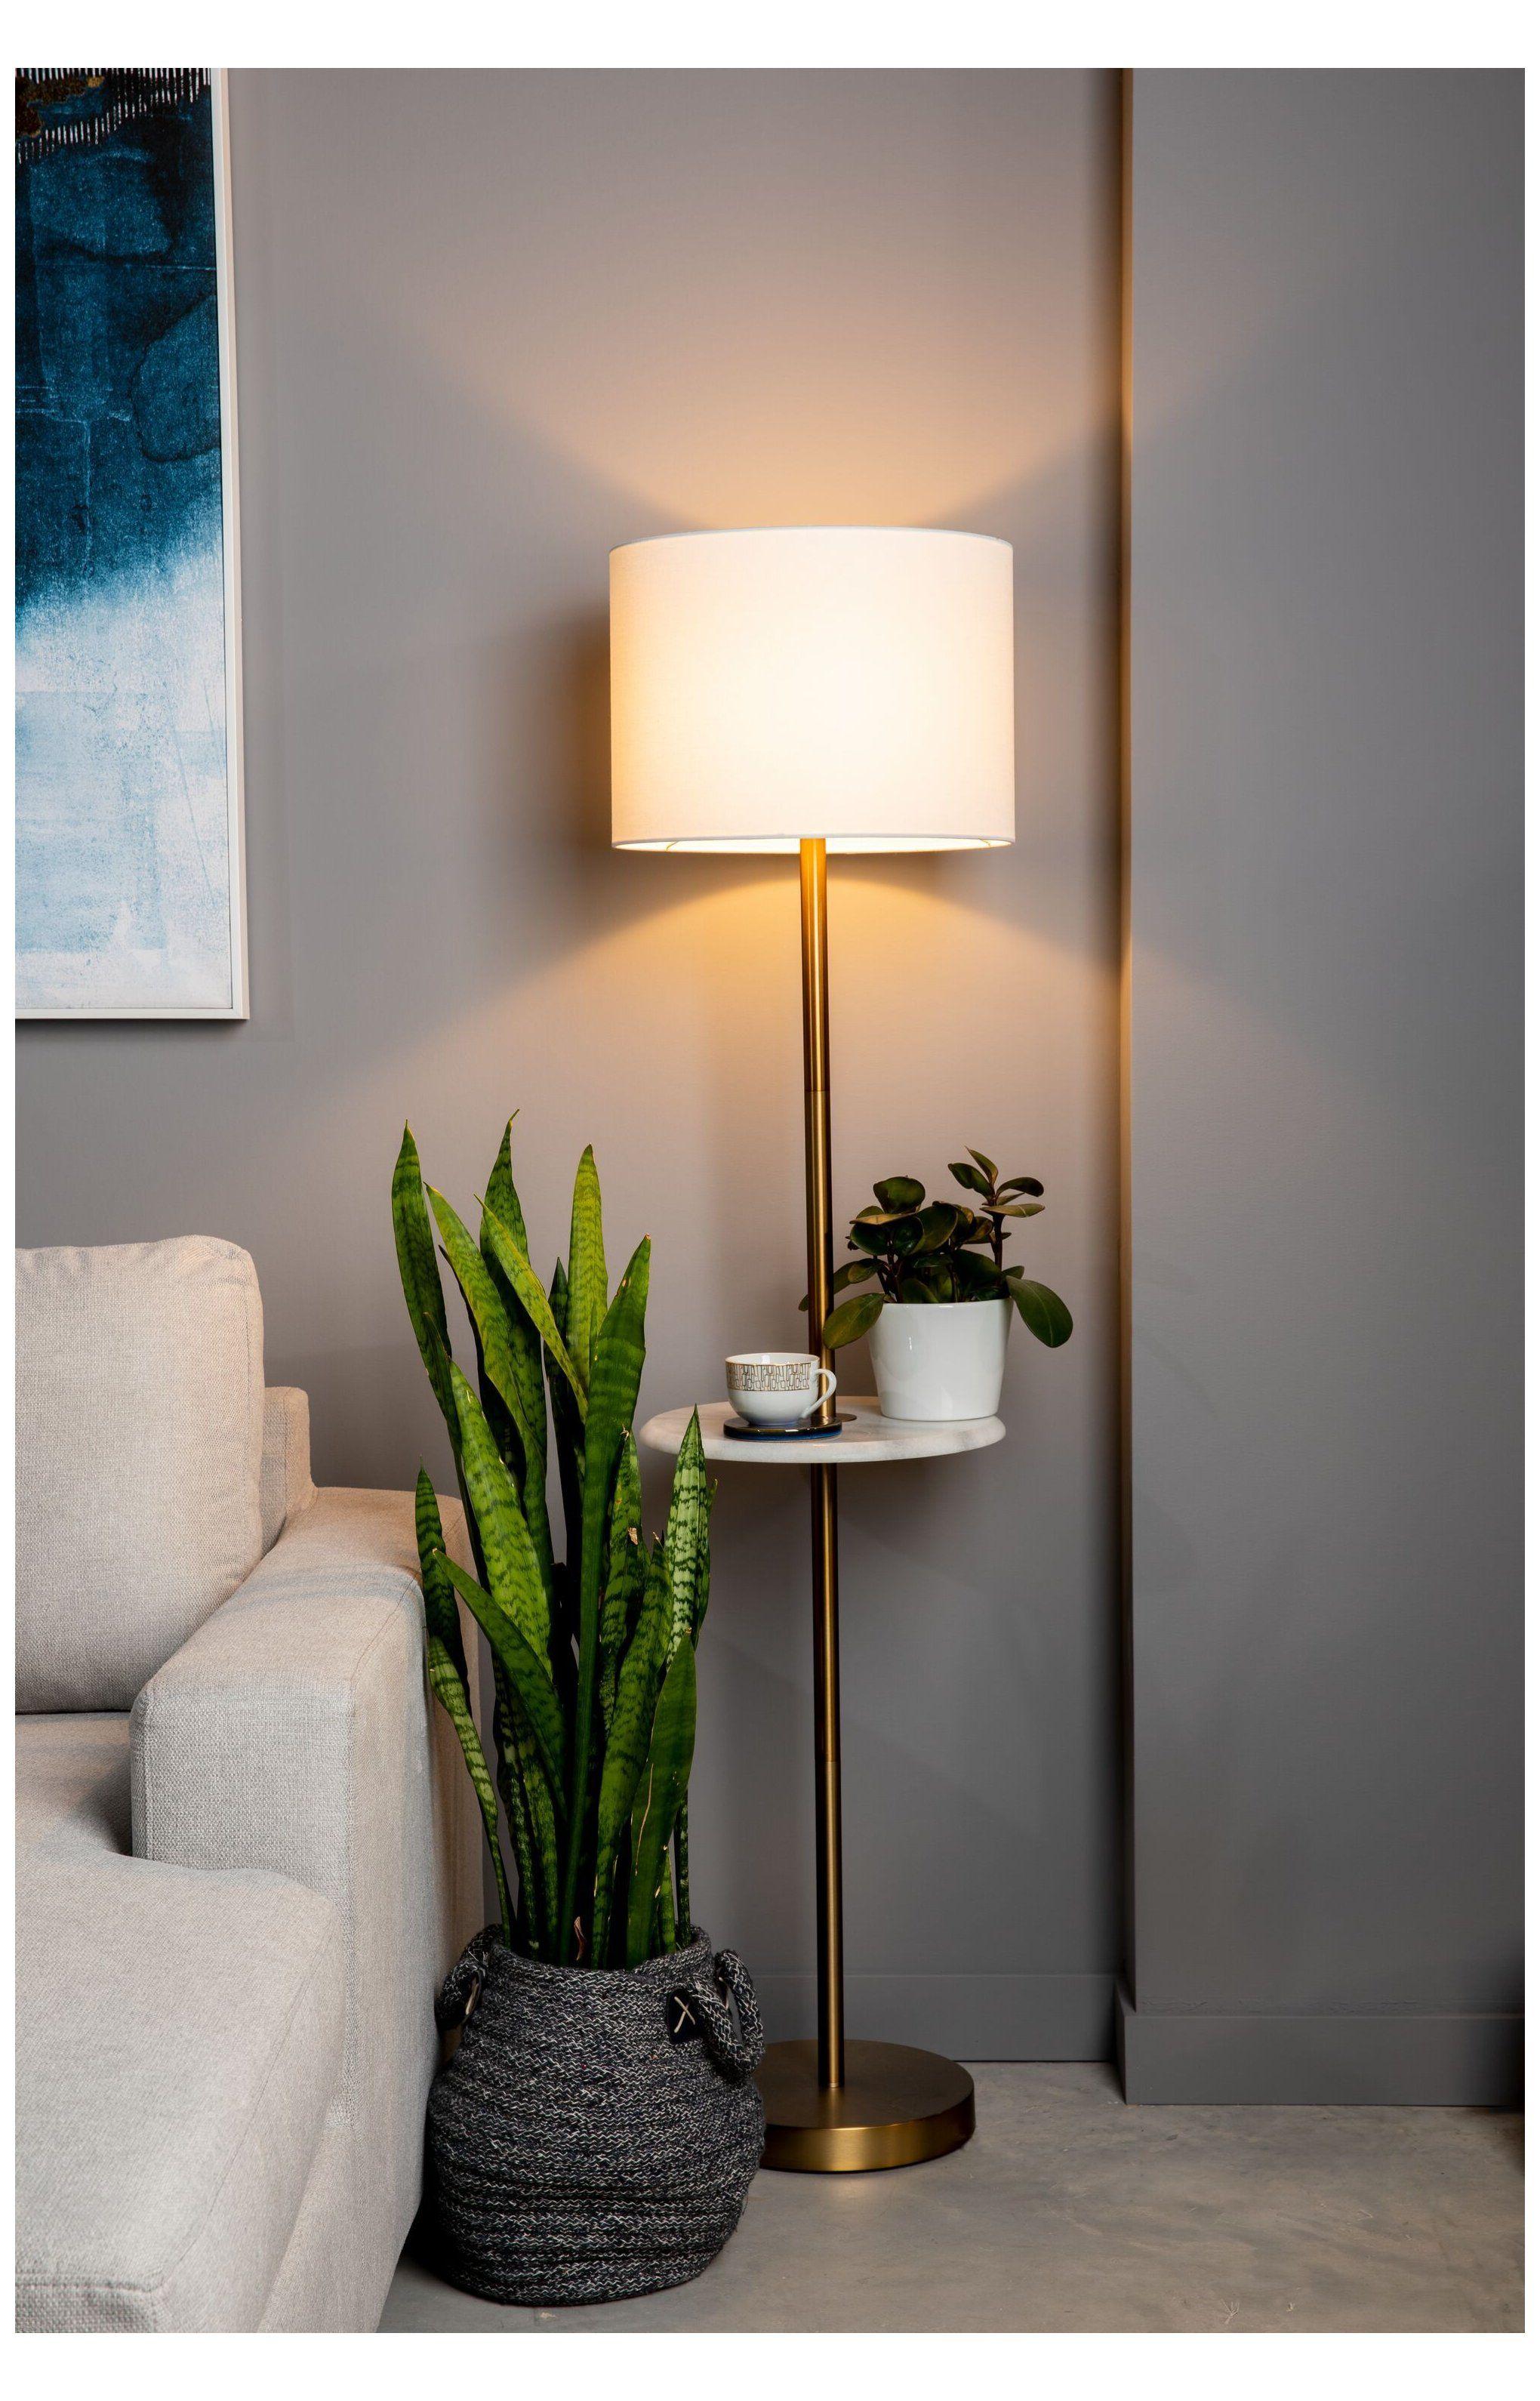 Solnn Bedroom Floor Lamp Ideas Bedroomfloorlampideas In 2021 Floor Lamps Living Room Stylish Floor Lamp Lamps Living Room